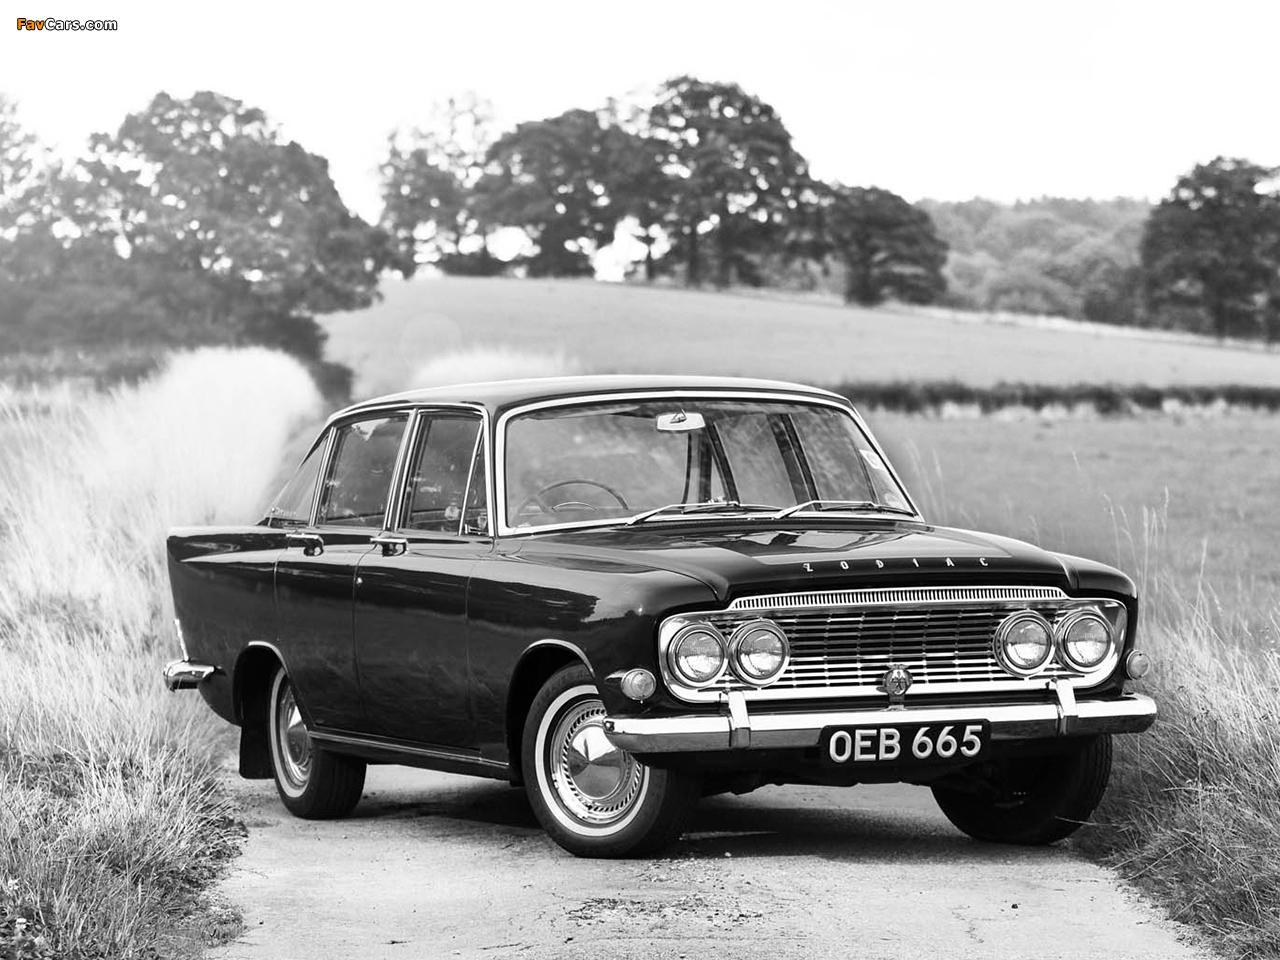 Ford Zodiac 1962 foto - 5